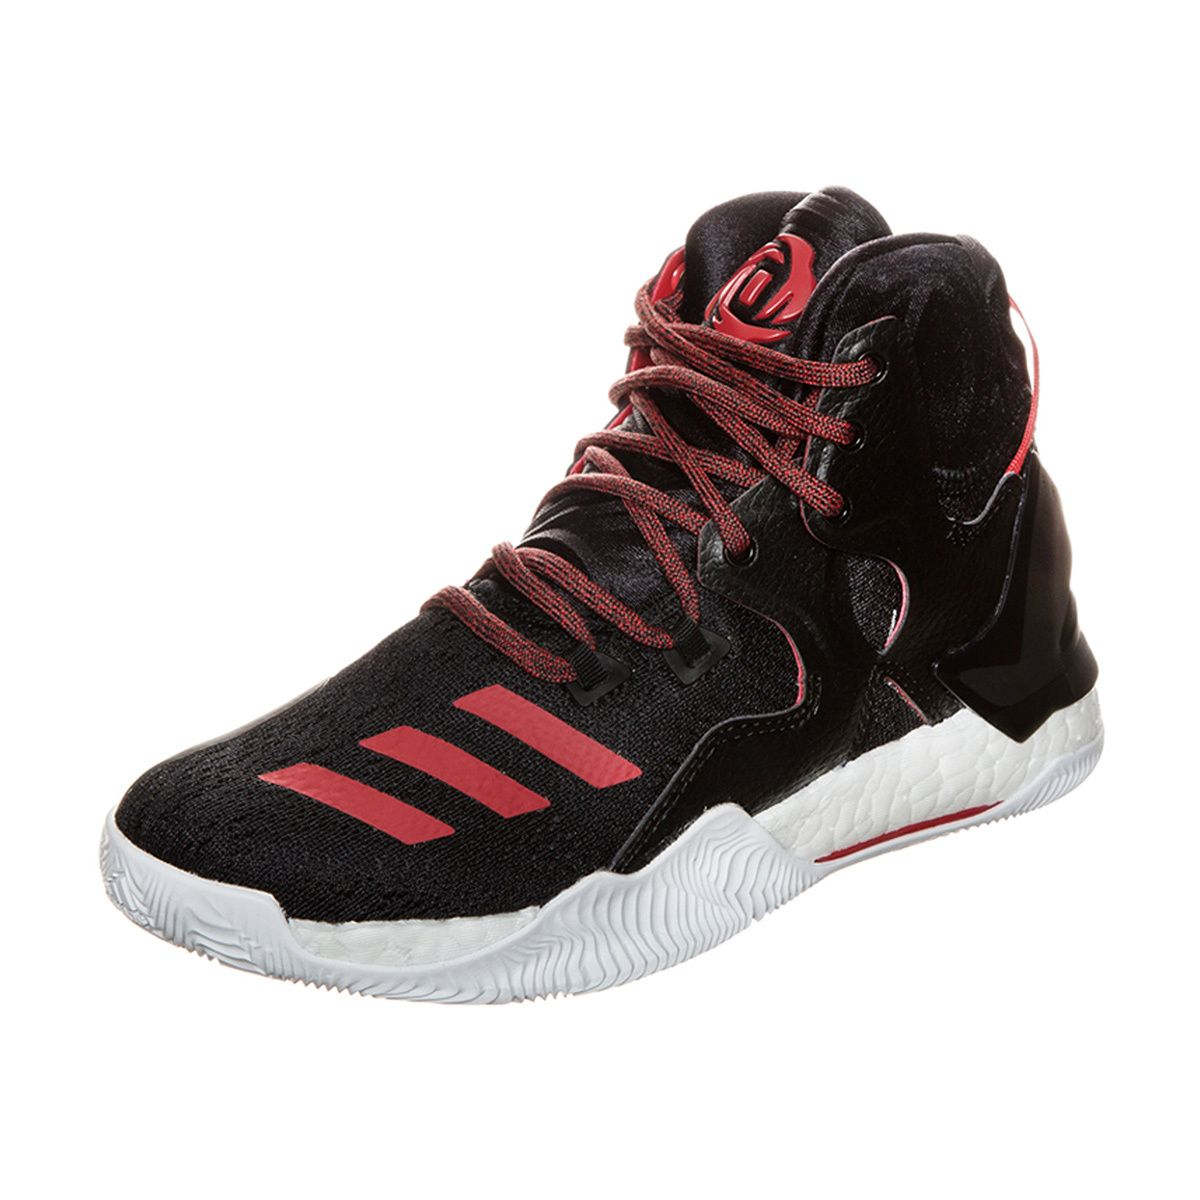 Schuhe Adidas James Harden Signature Herren Adidas Crazylight Boost 2.5 Einzigartig Designed